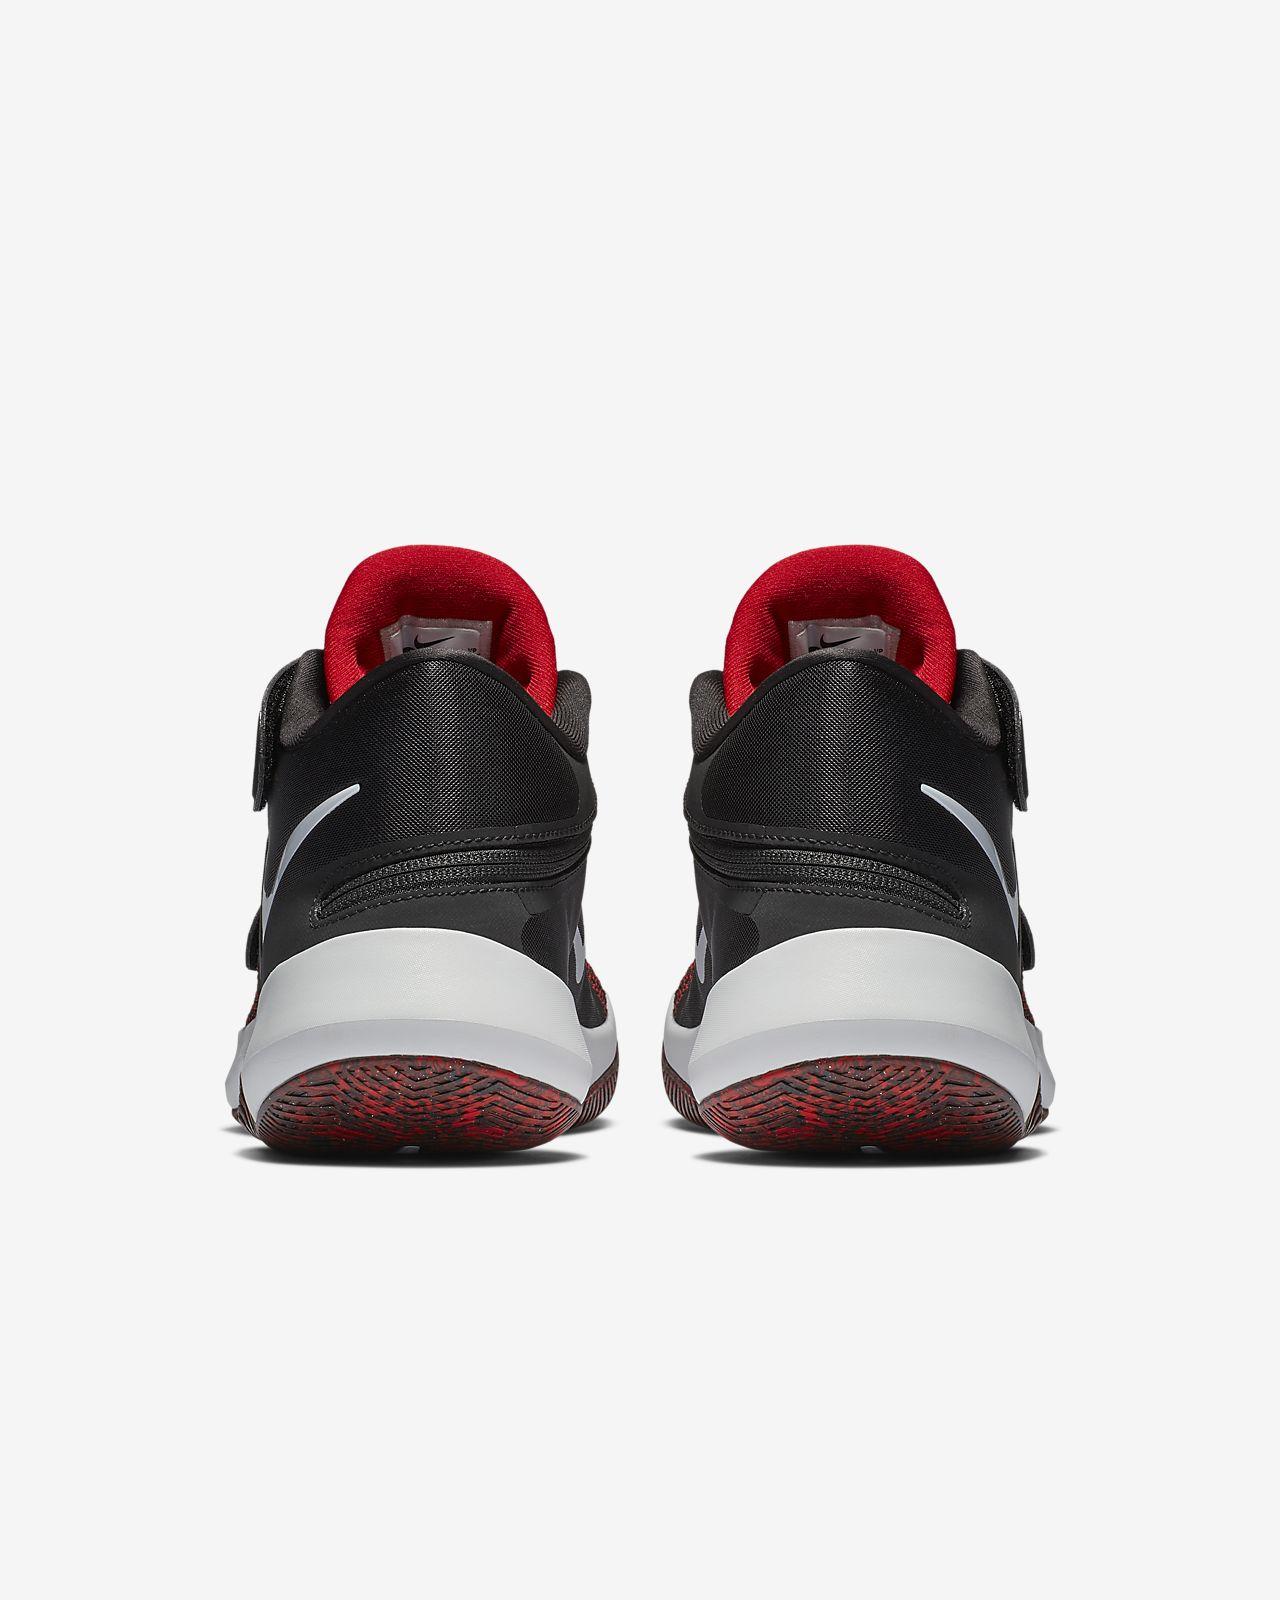 sale retailer f95f1 25c80 ... Nike Air Precision II FlyEase Men s Basketball Shoe